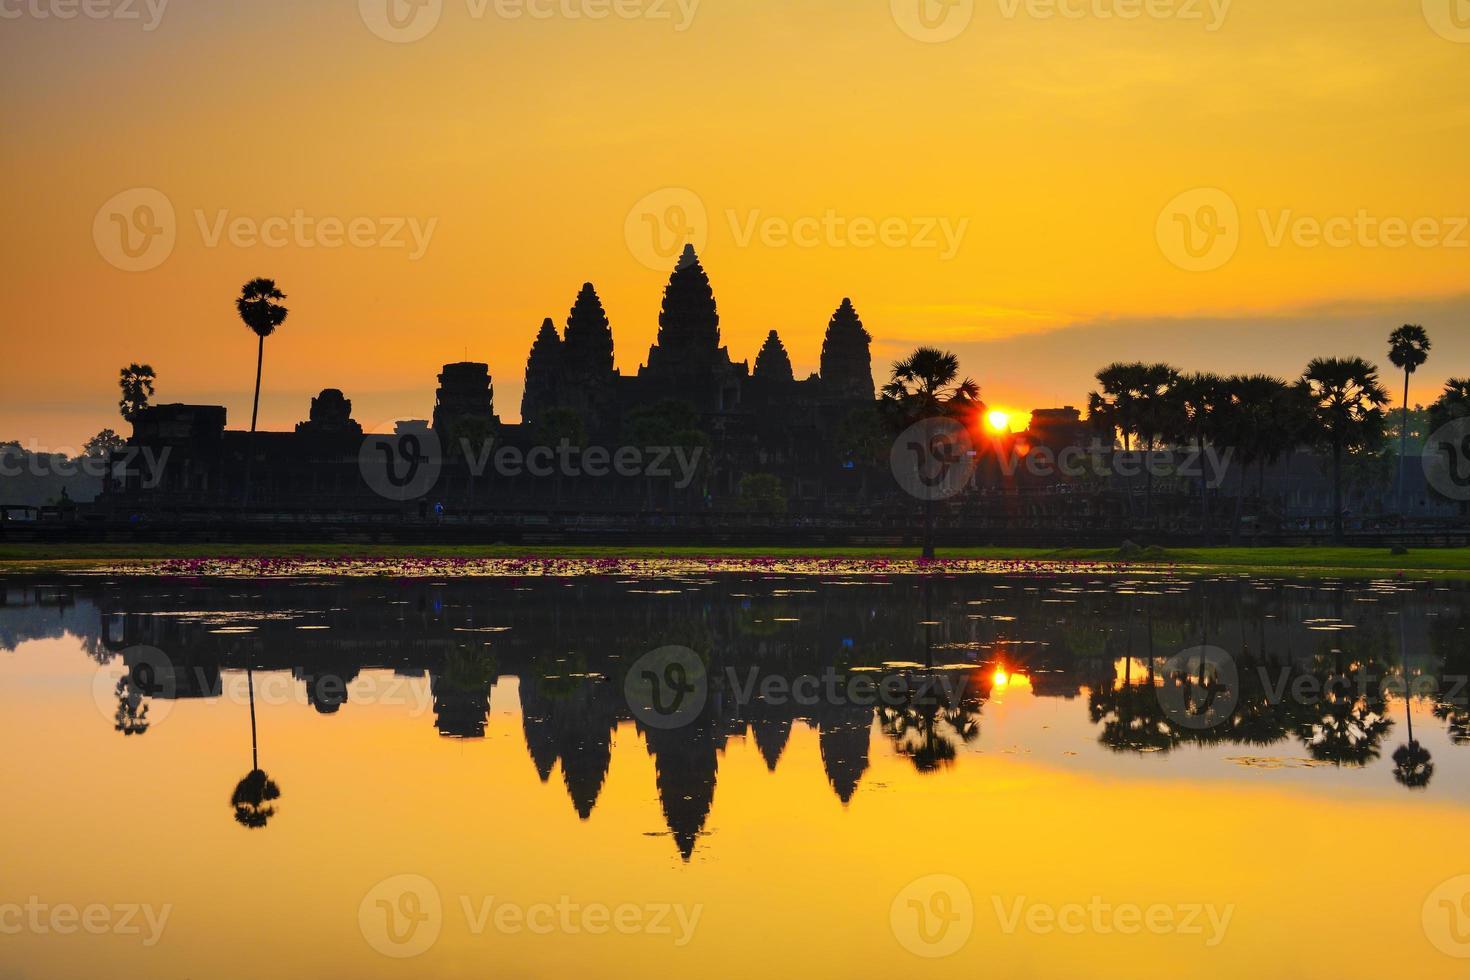 Ankor Wat, foto tomada al amanecer